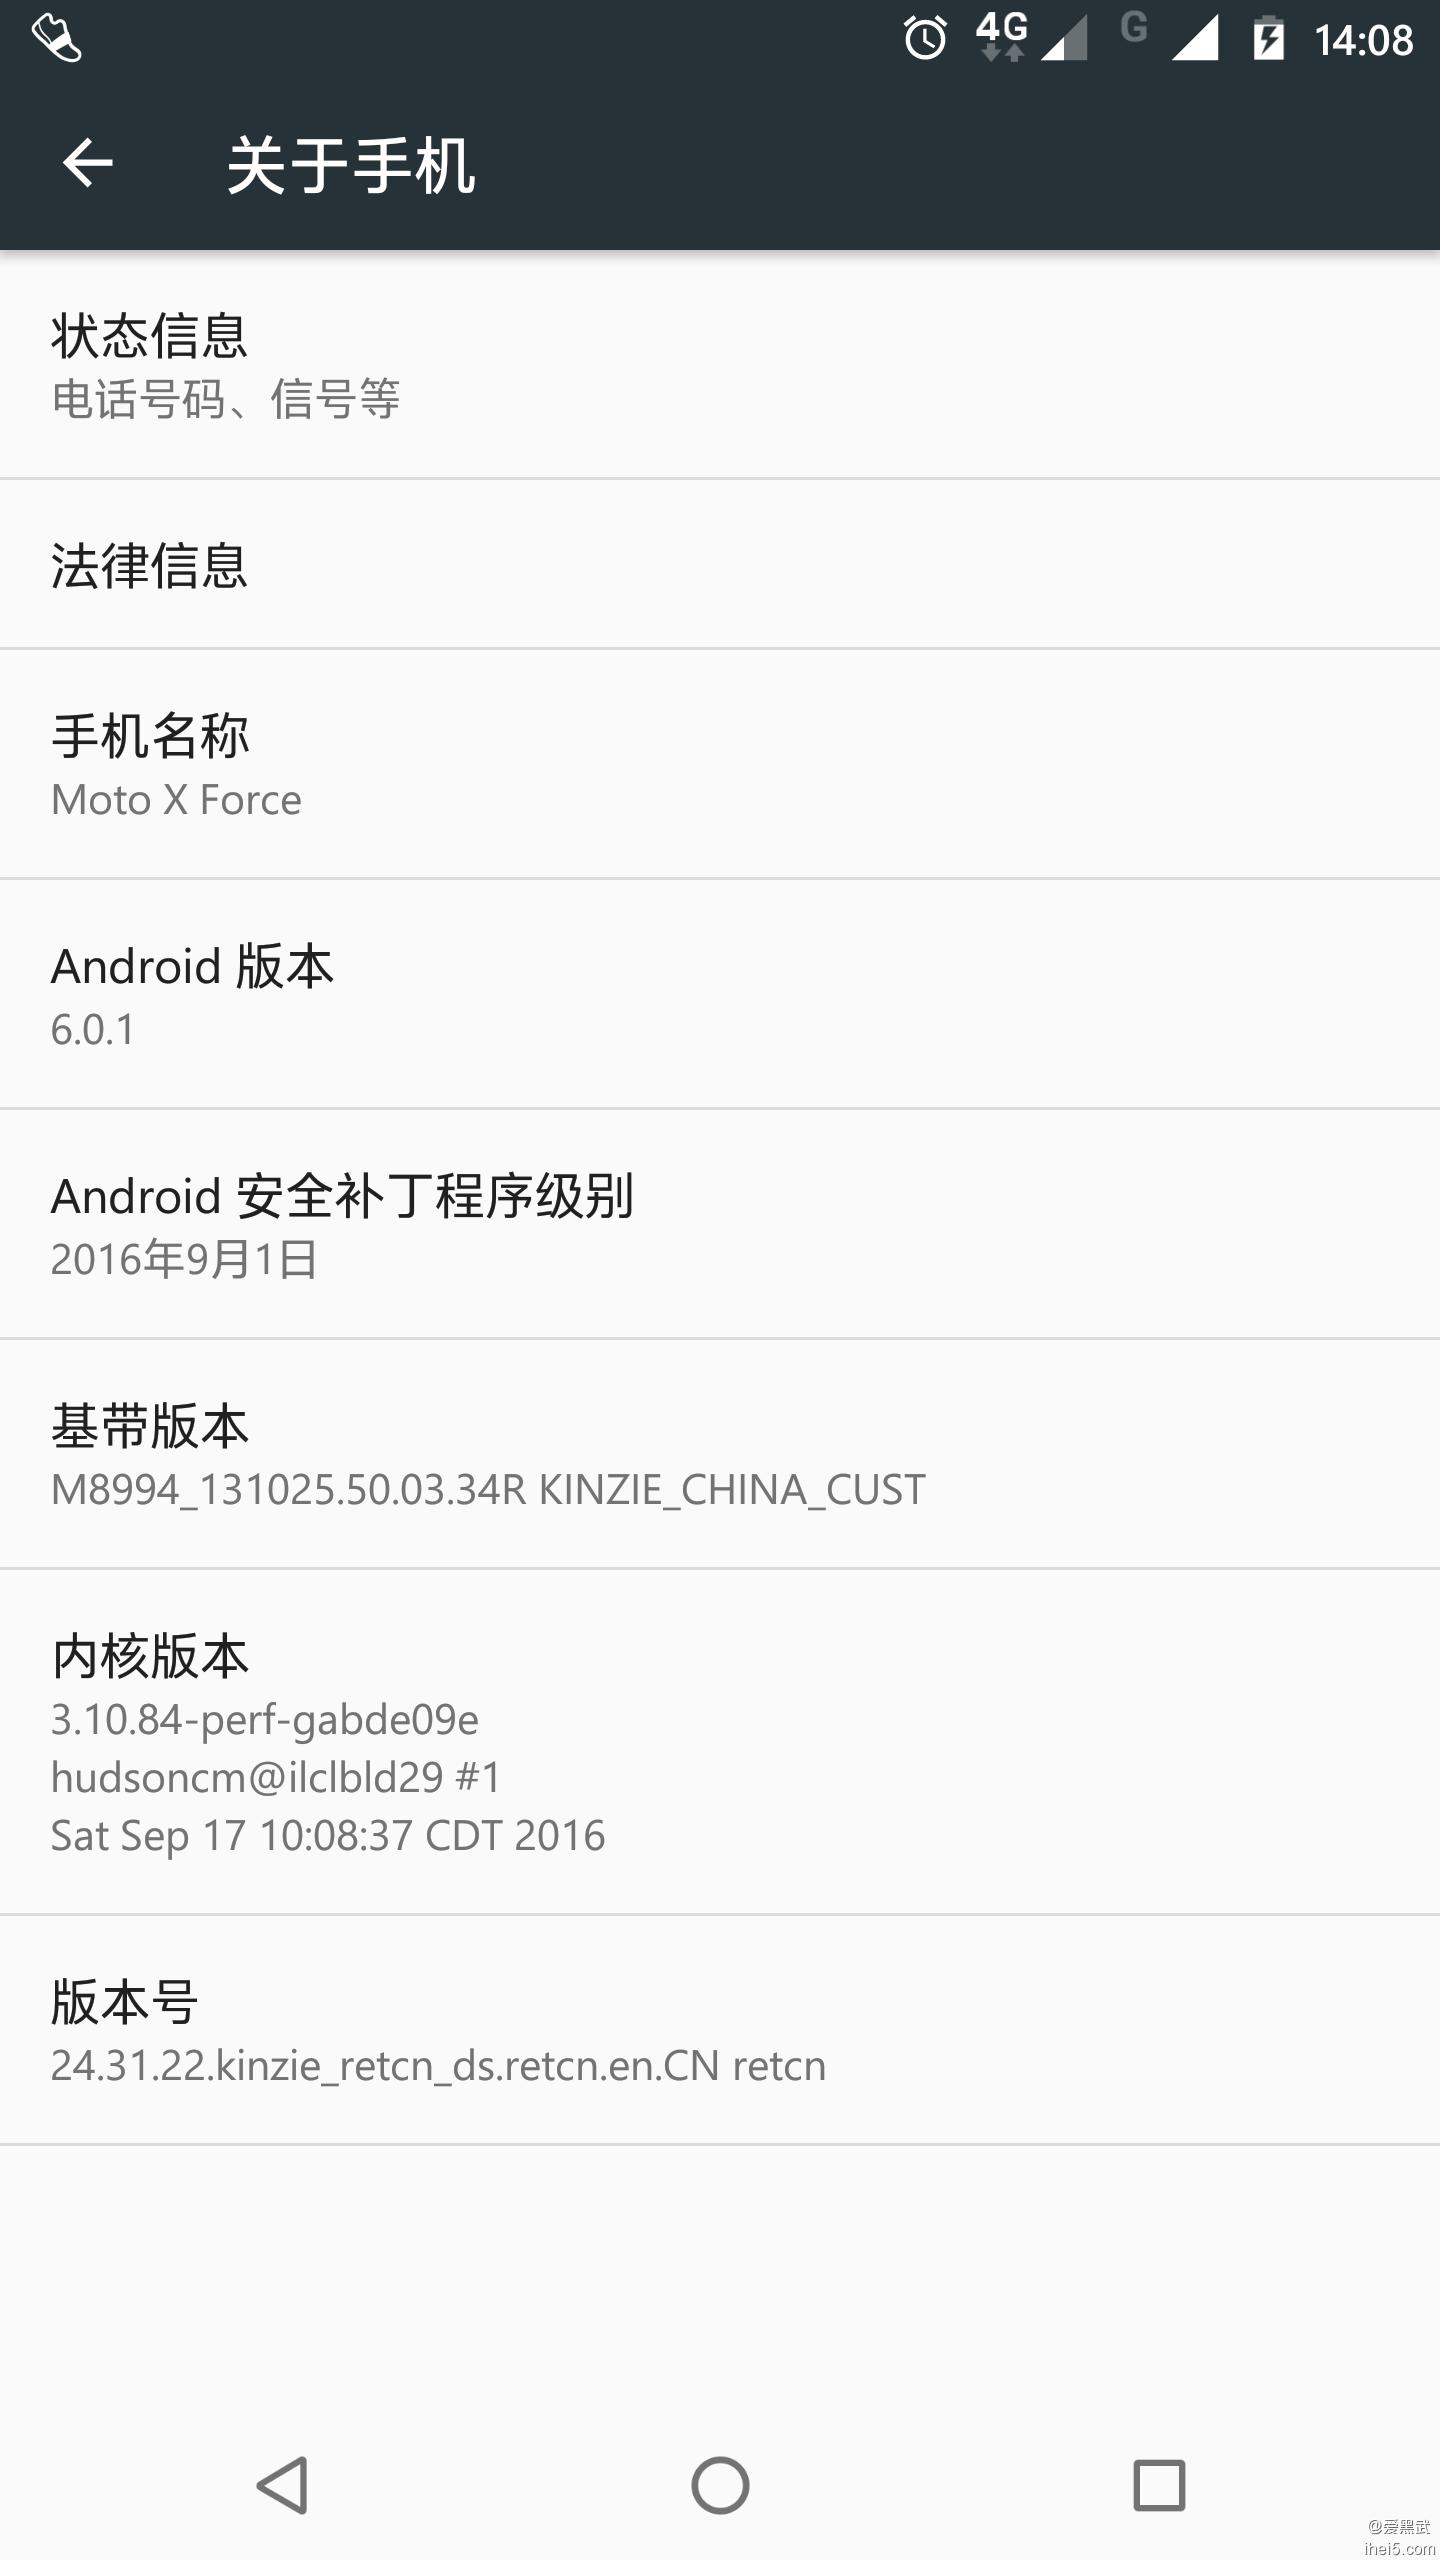 Screenshot_20171002-140818.png